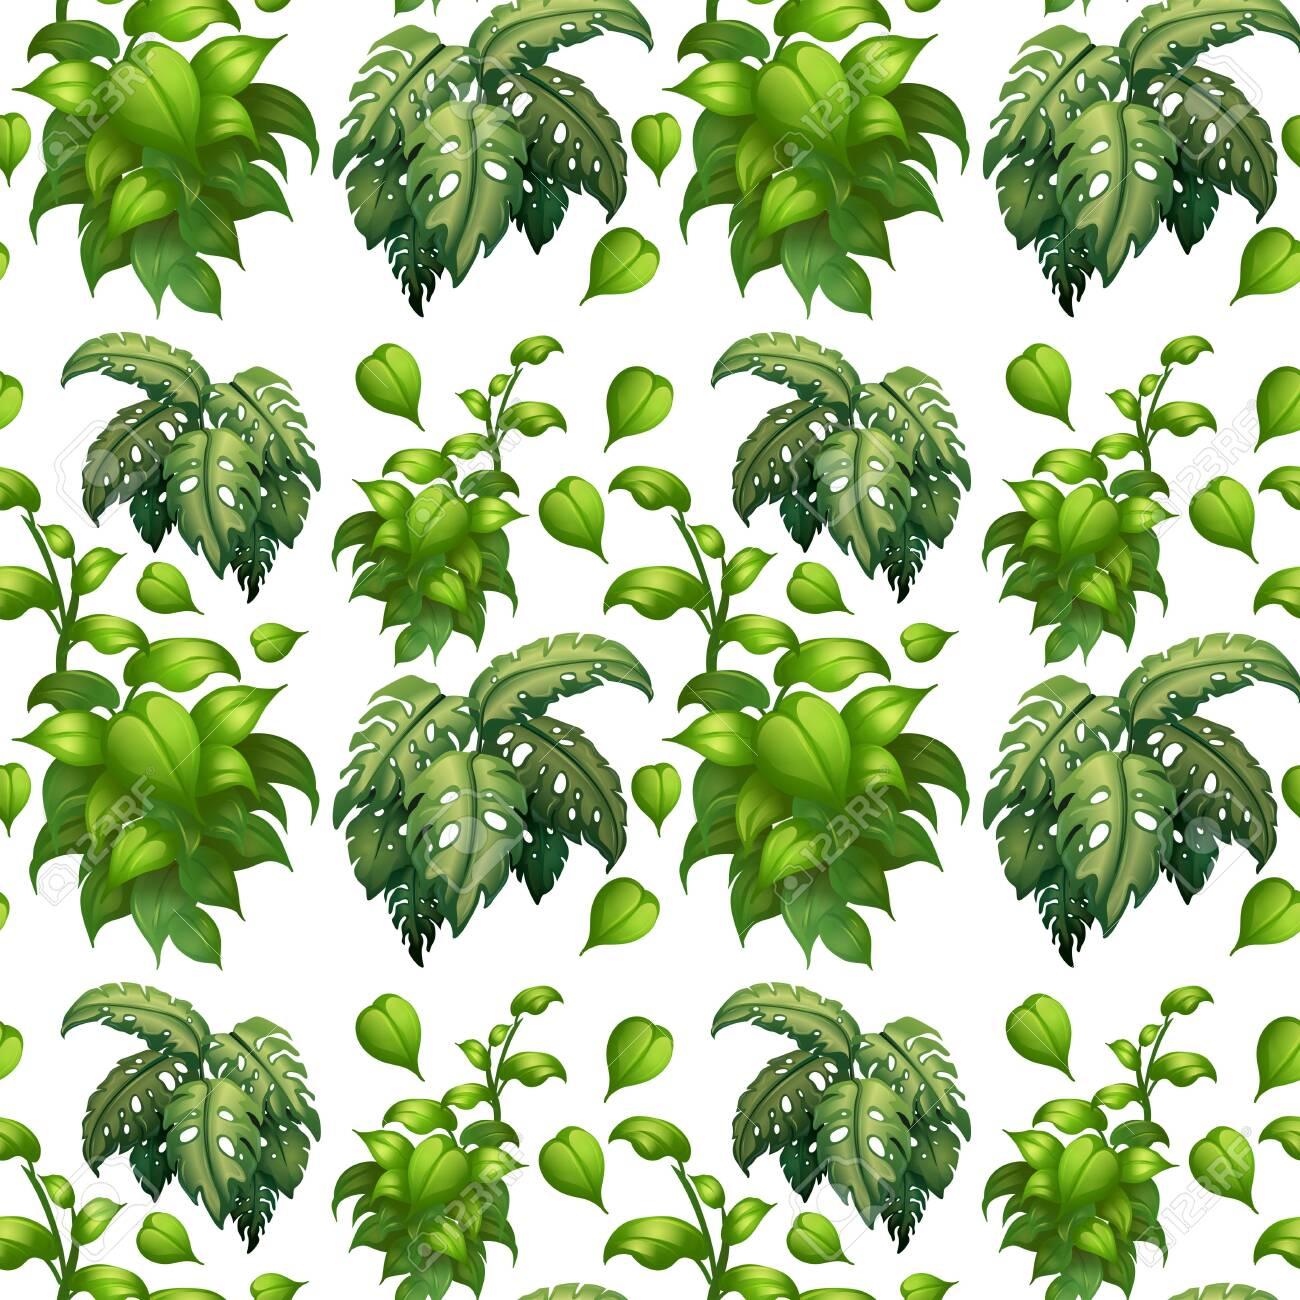 Green leaf seamless pattern illustration - 121751198